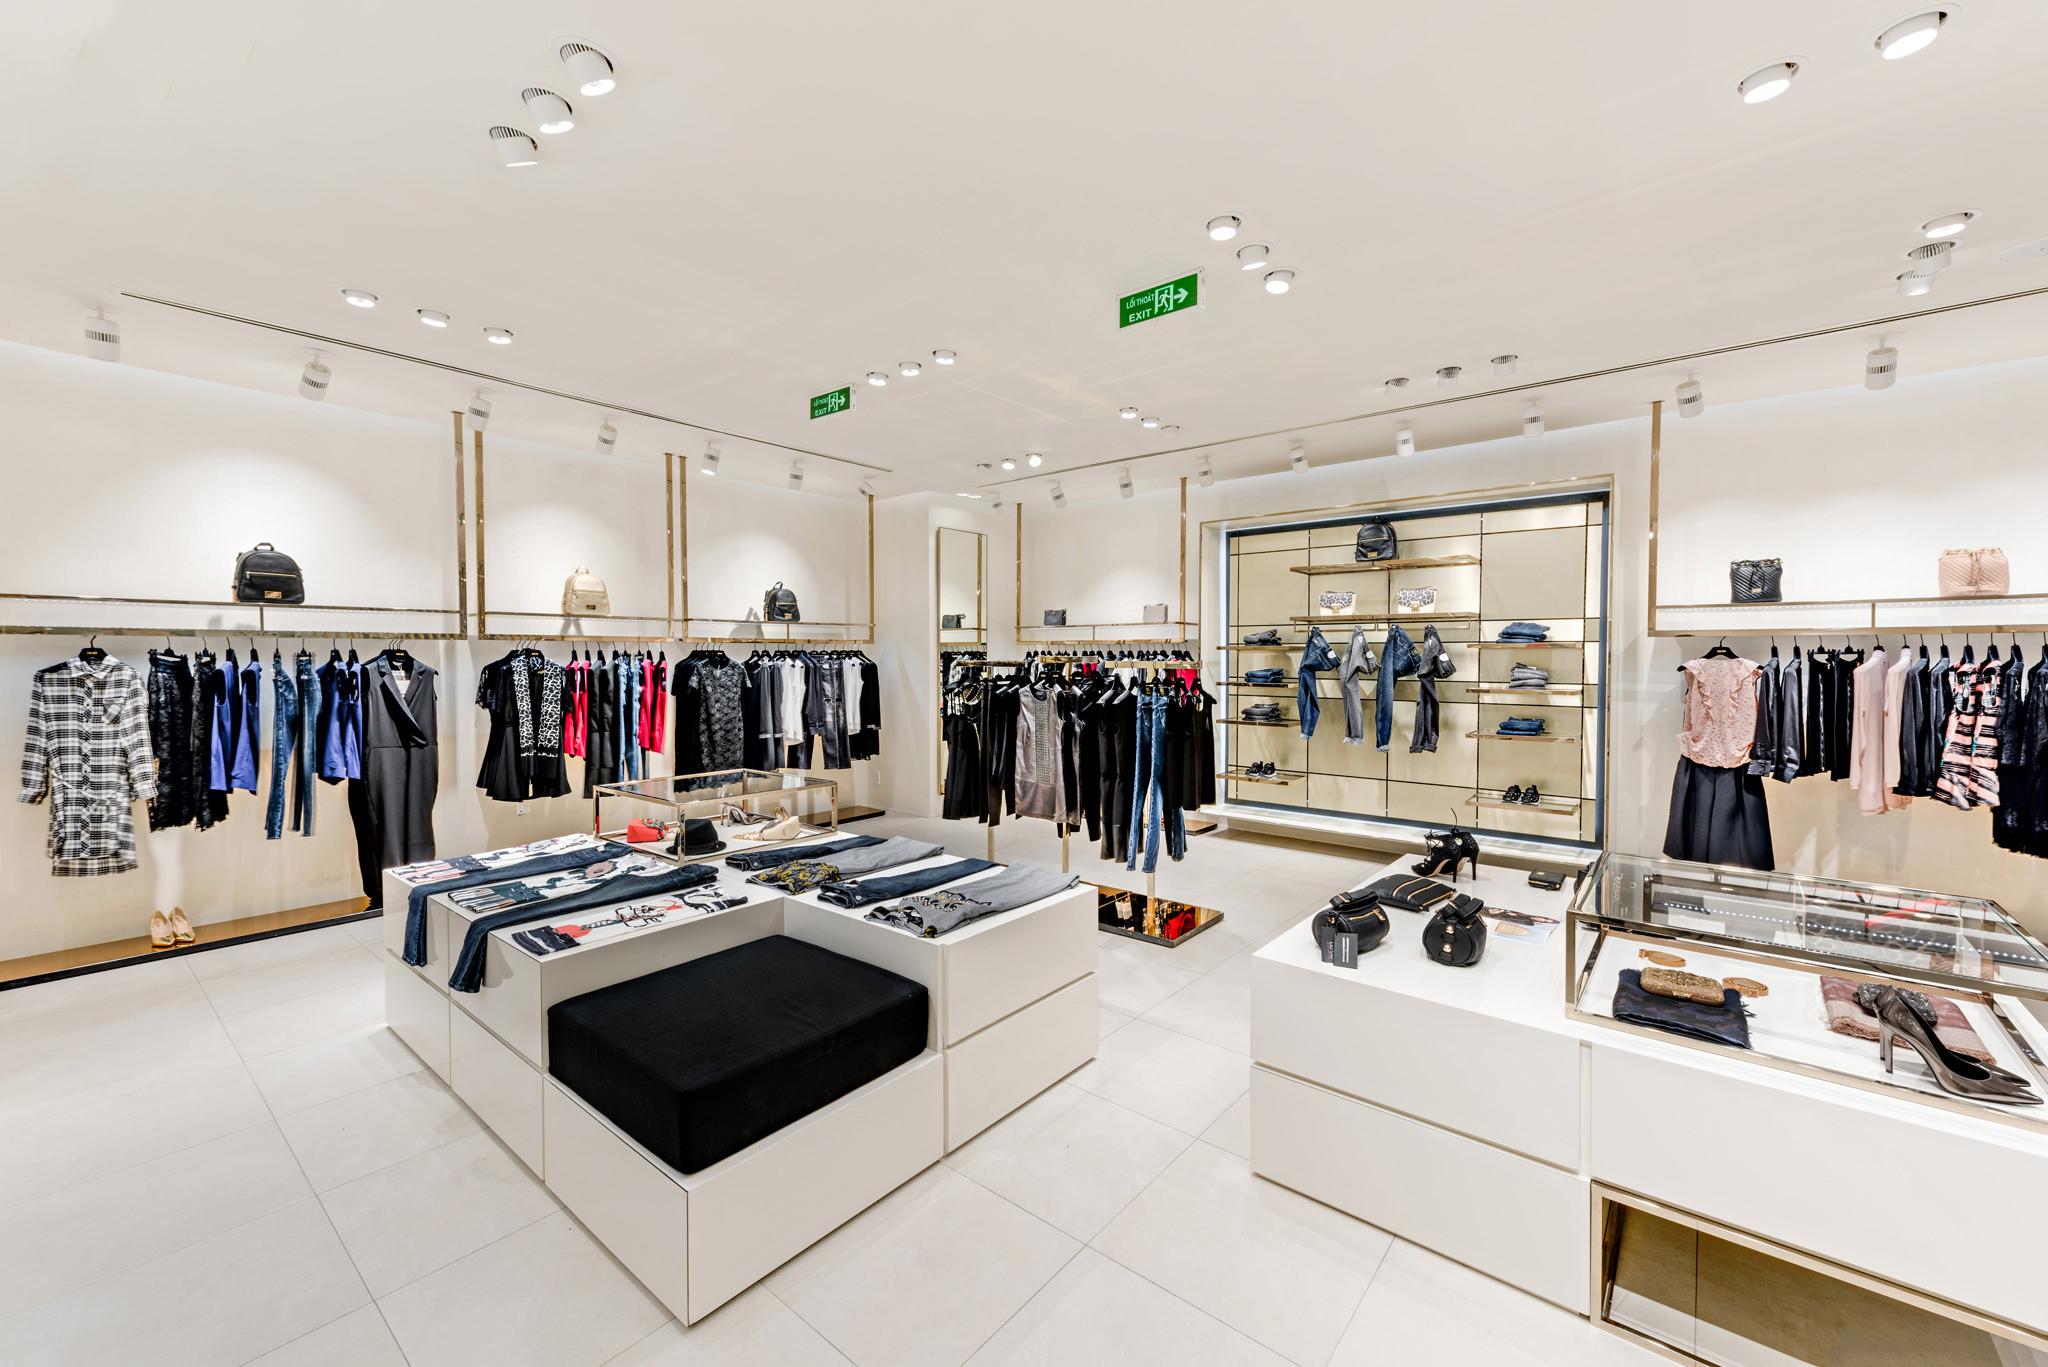 20160801 - Liu Jo - HCM - Commercial - Interior - Store - Retouch 0004.jpg